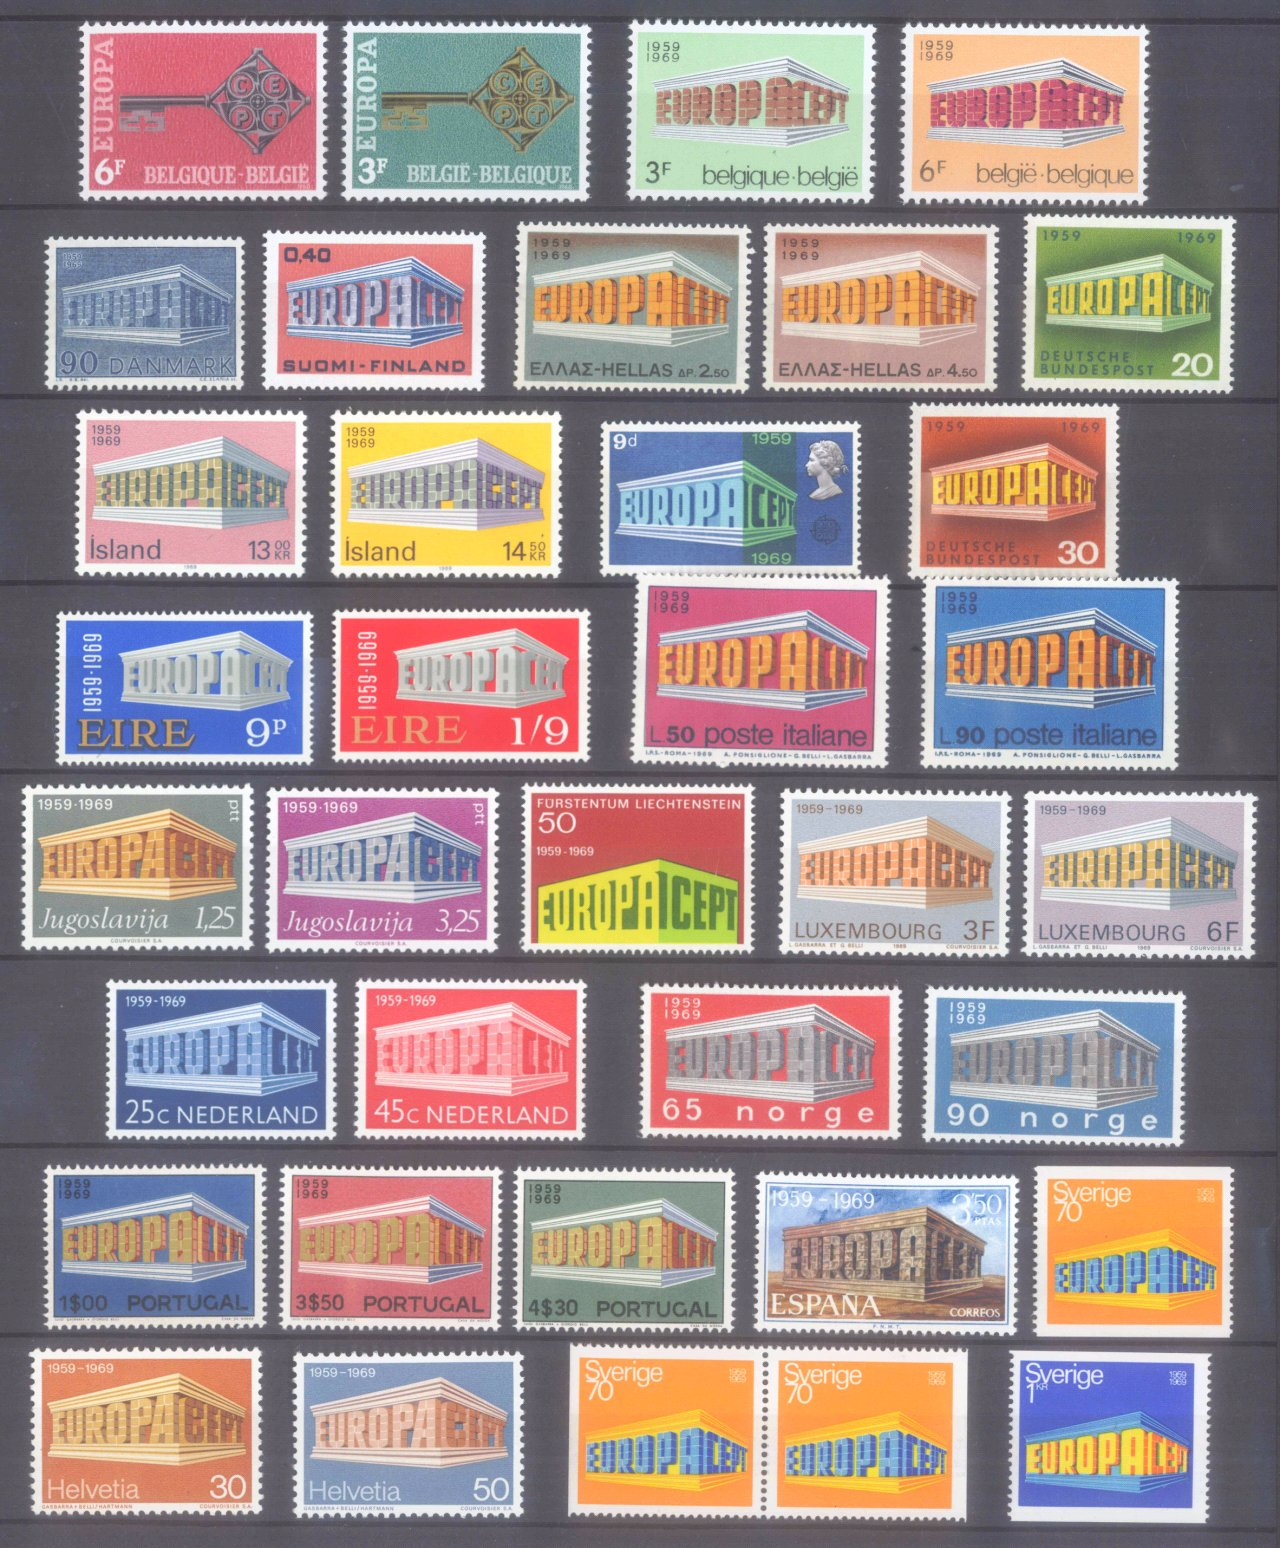 EUROPA CEPT 1956 – 1970-9